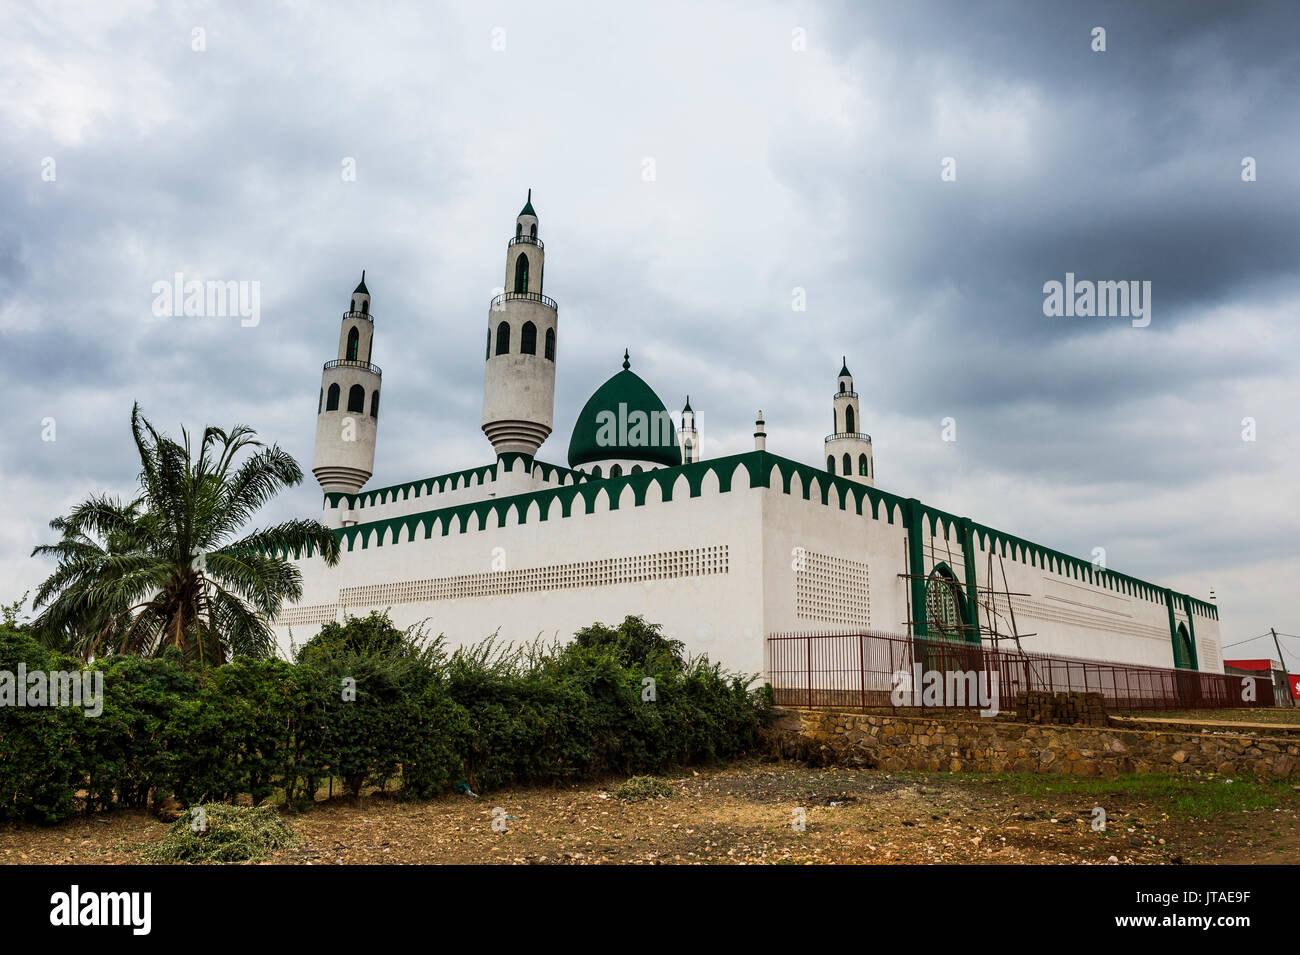 Grand Mosque of Bujumbura, Burundi, Africa - Stock Image